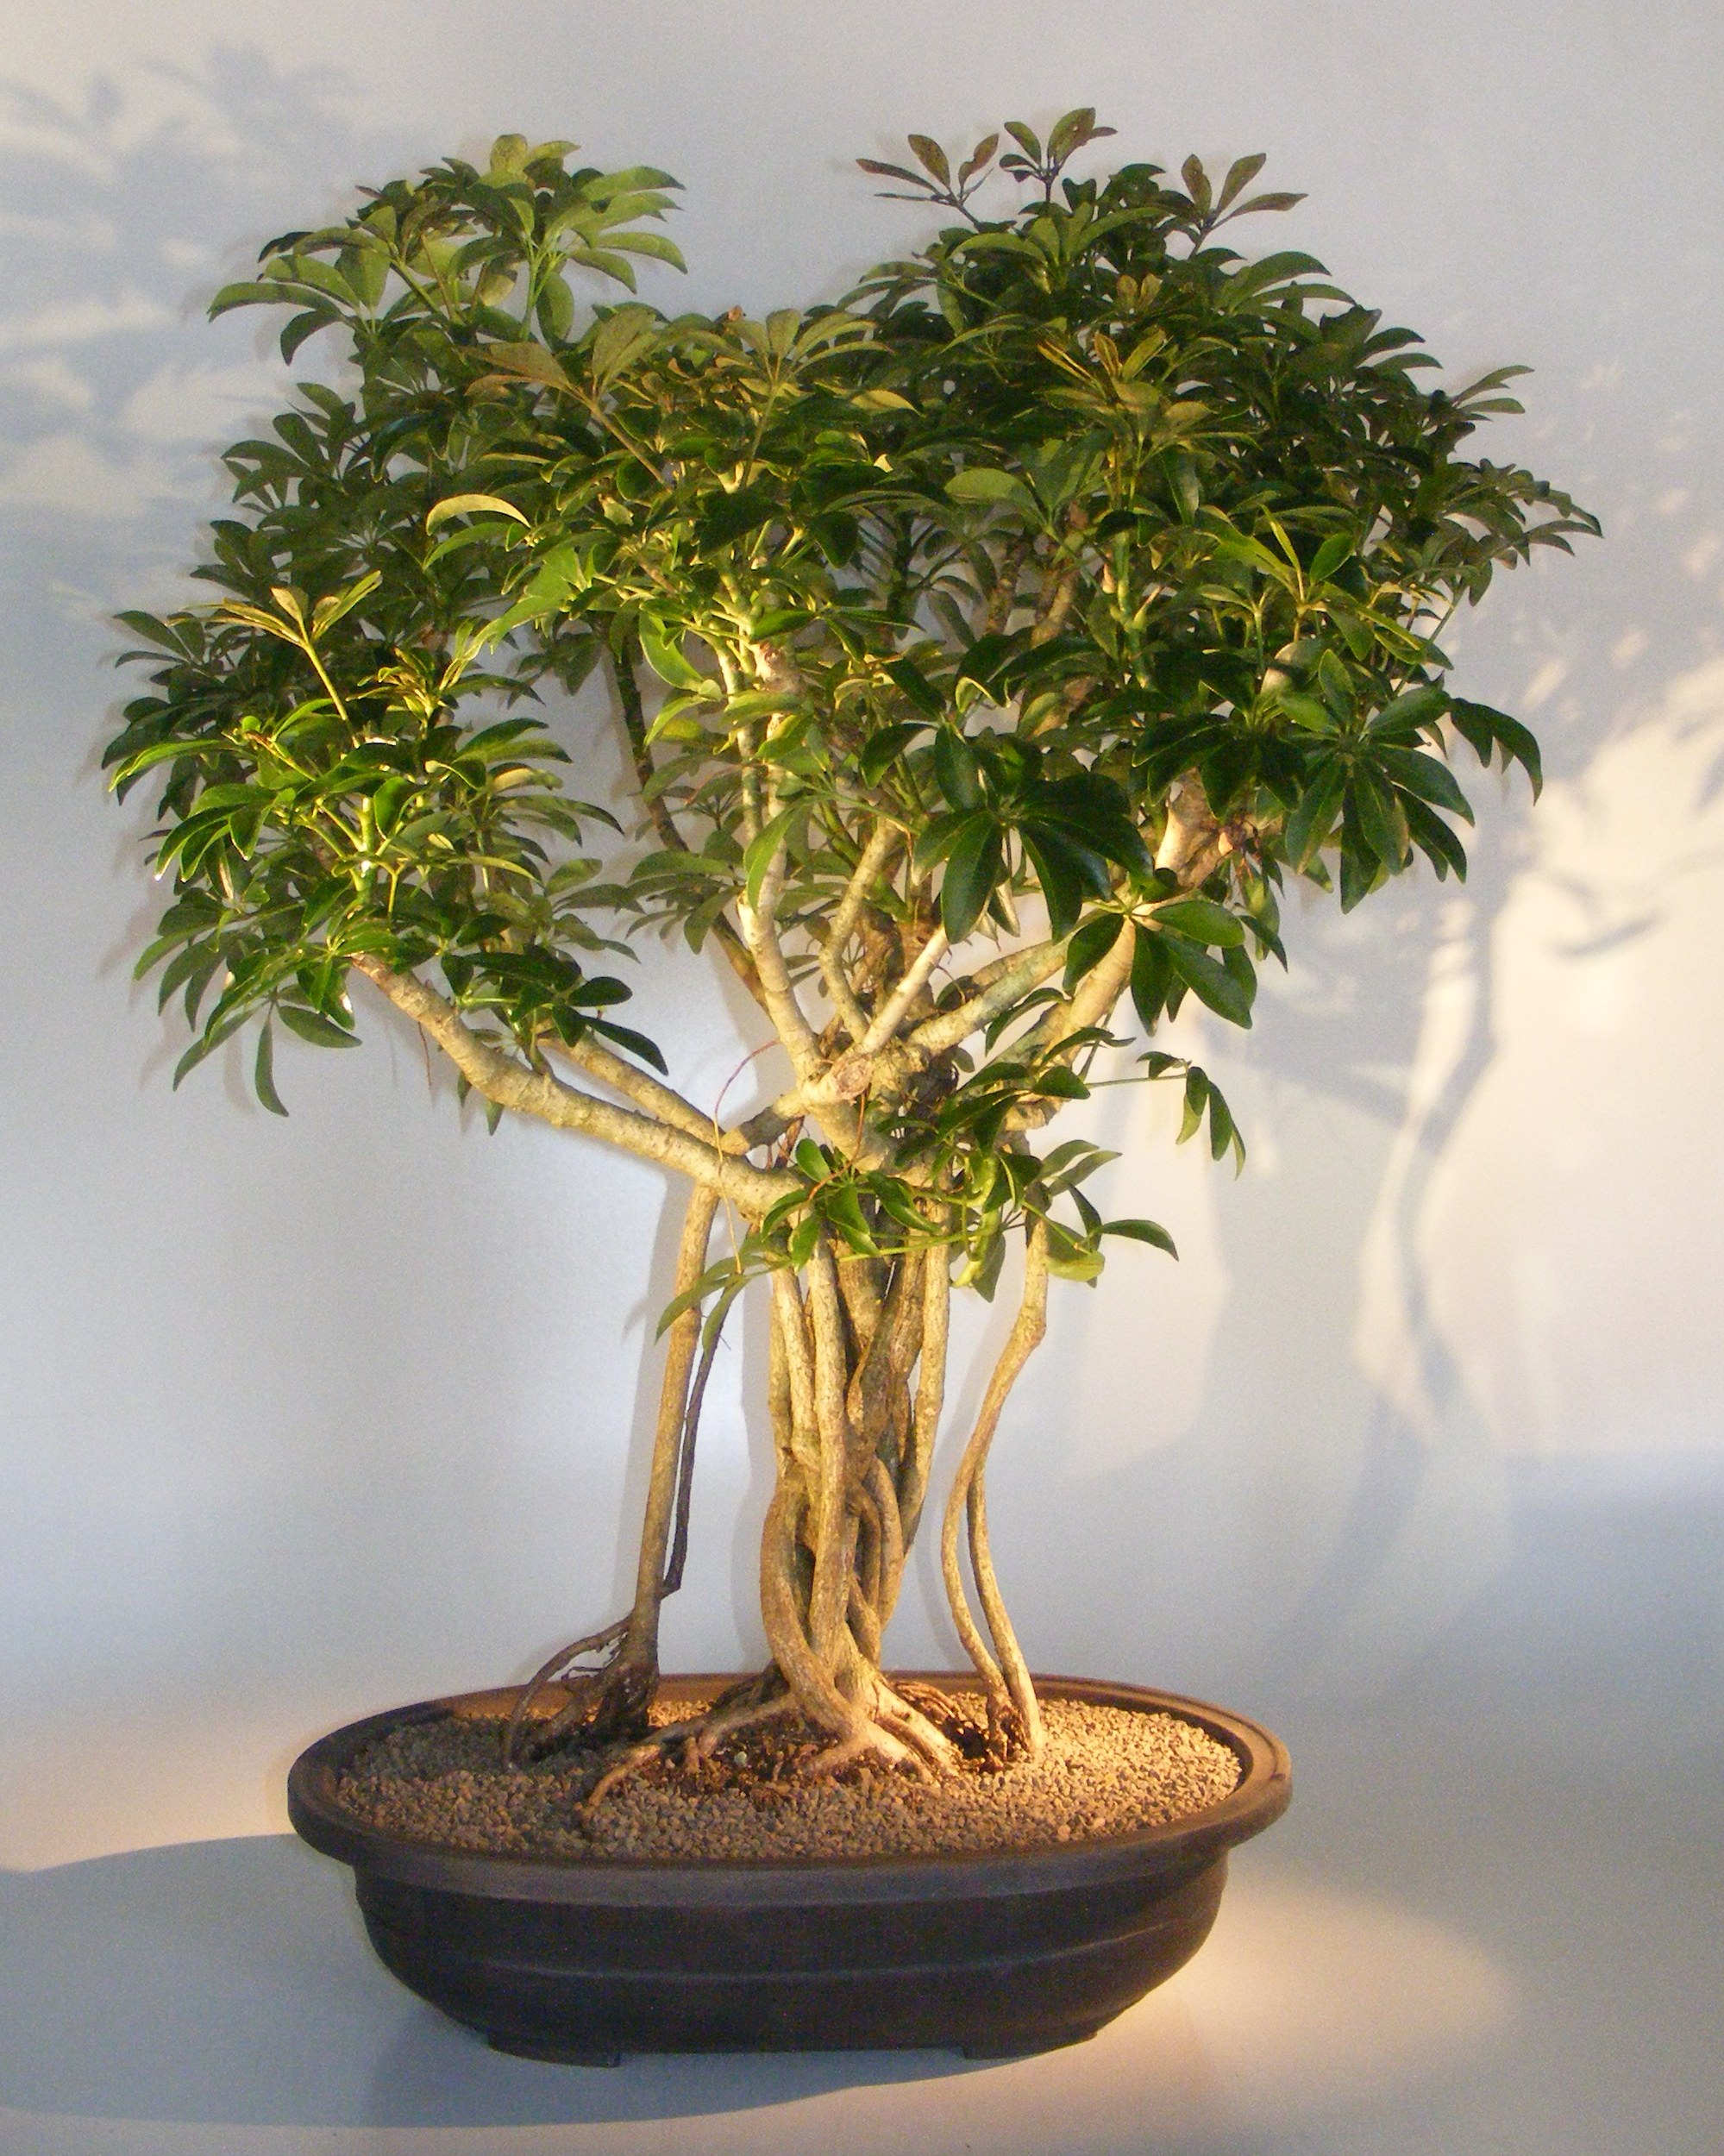 Hawaiian Umbrella Bonsai TreeBanyan Style(arboricola schfflera) Image